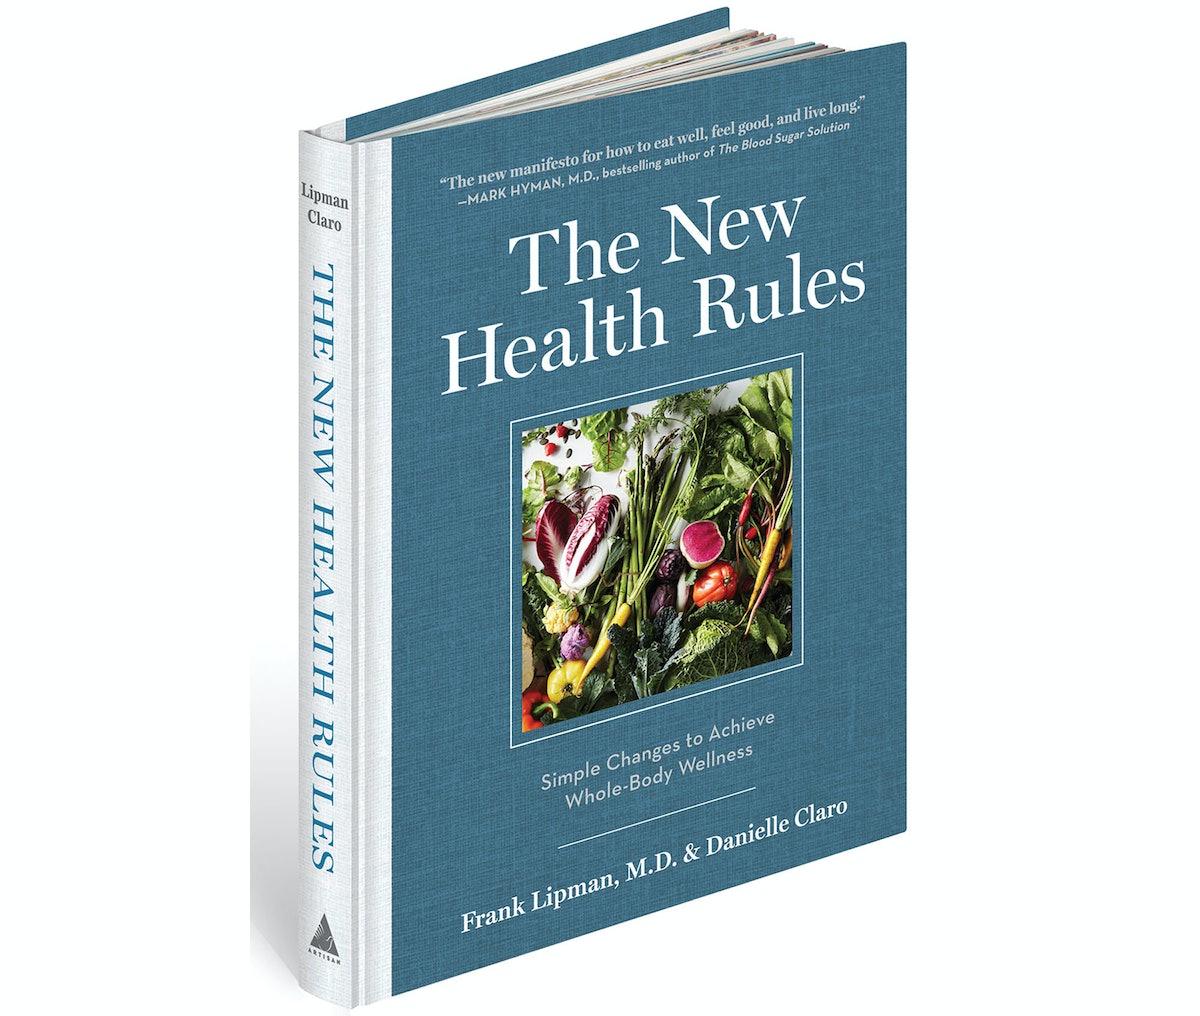 The New Health Rules by Frank Lipman, M.D. & Danielle Claro